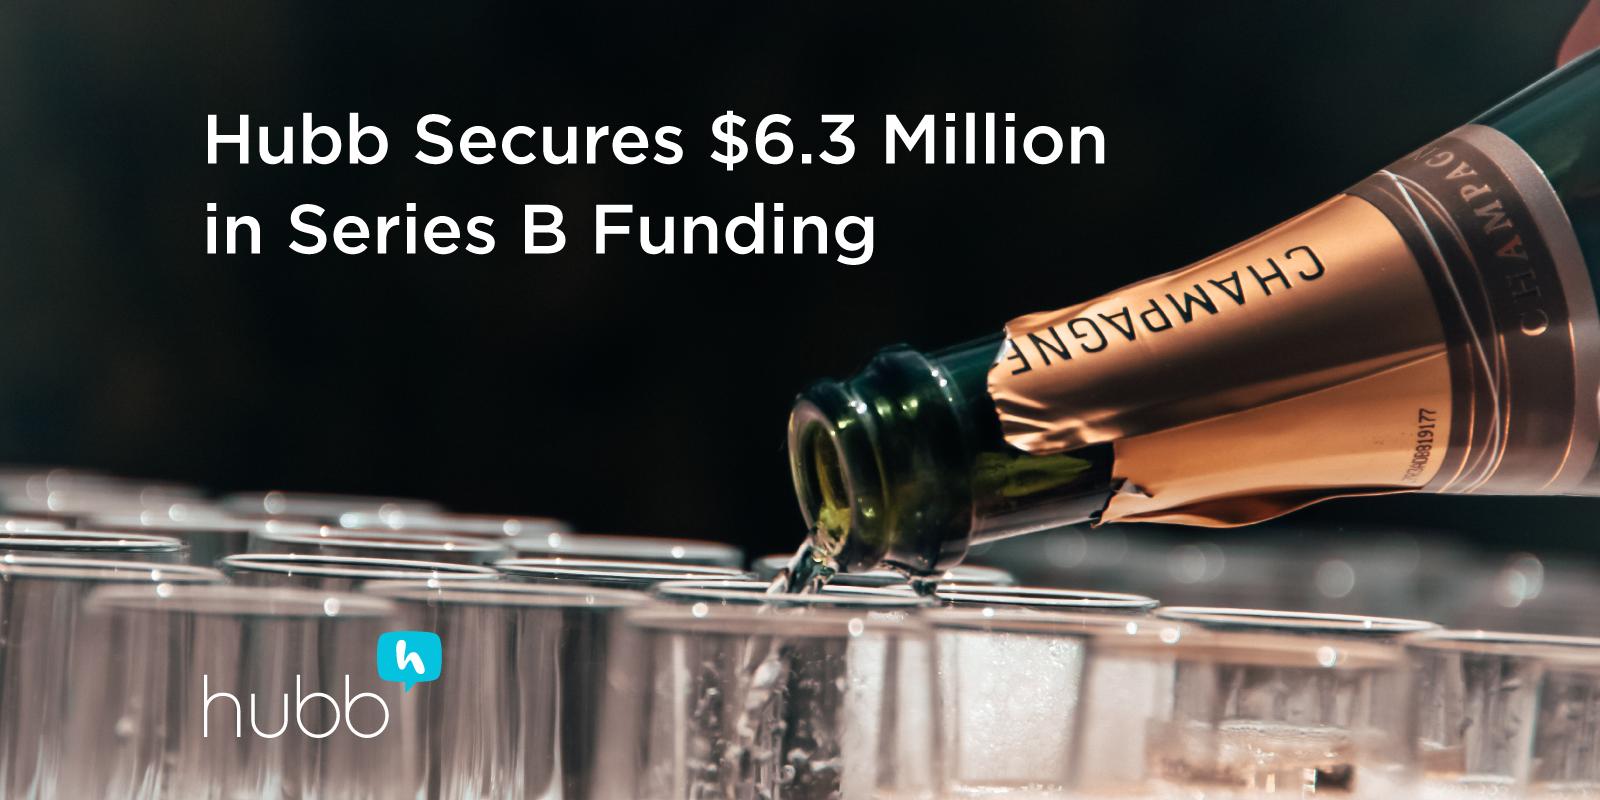 Announcing Hubb's Series B funding round